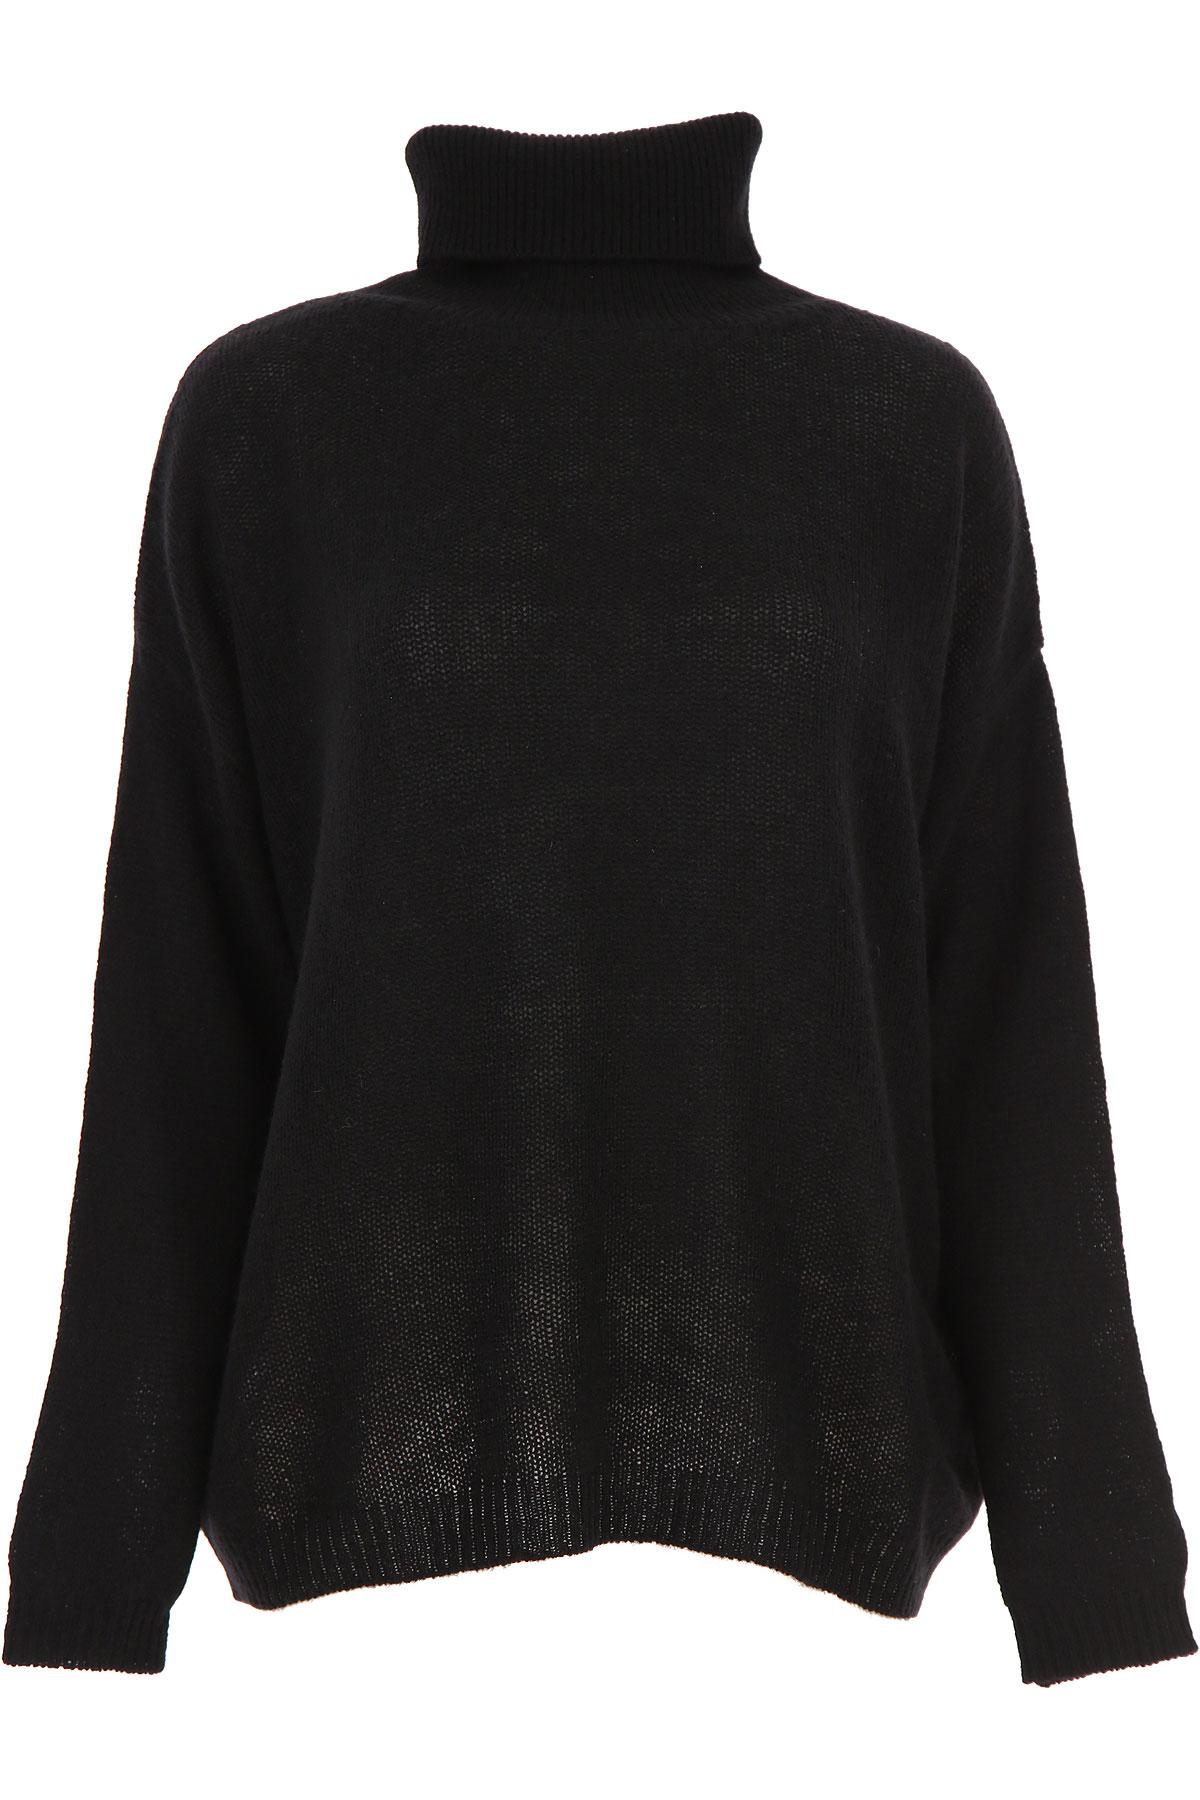 Aspesi Sweater for Women Jumper On Sale, Black, Yack, 2019, 2 4